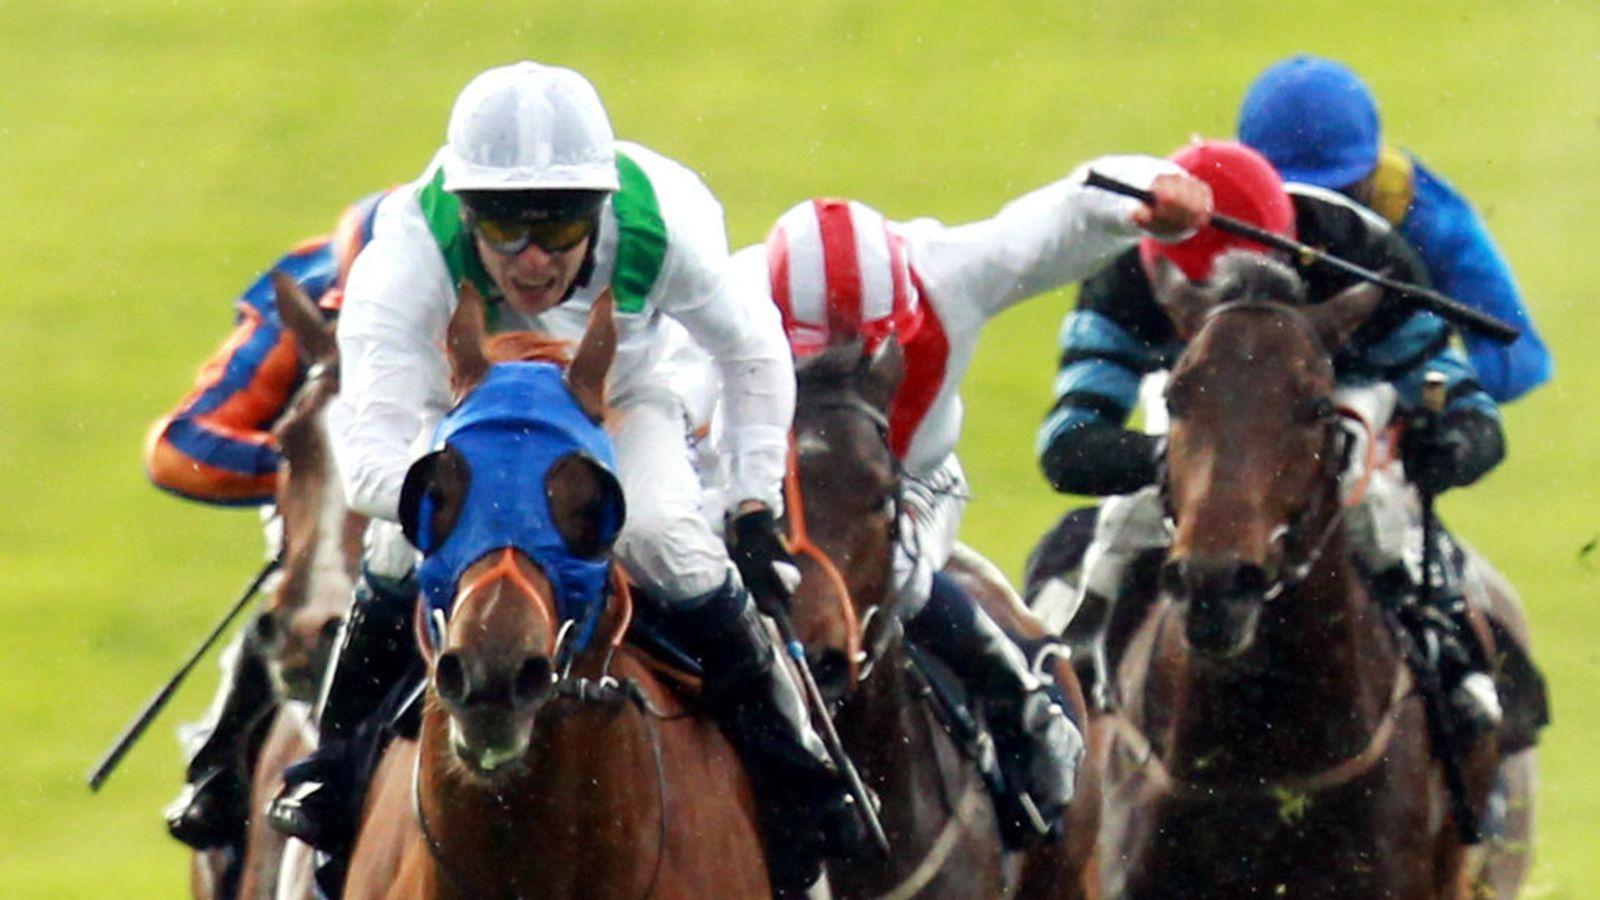 Glory awaits 2000 guineas betting how to buy bitcoins in ireland